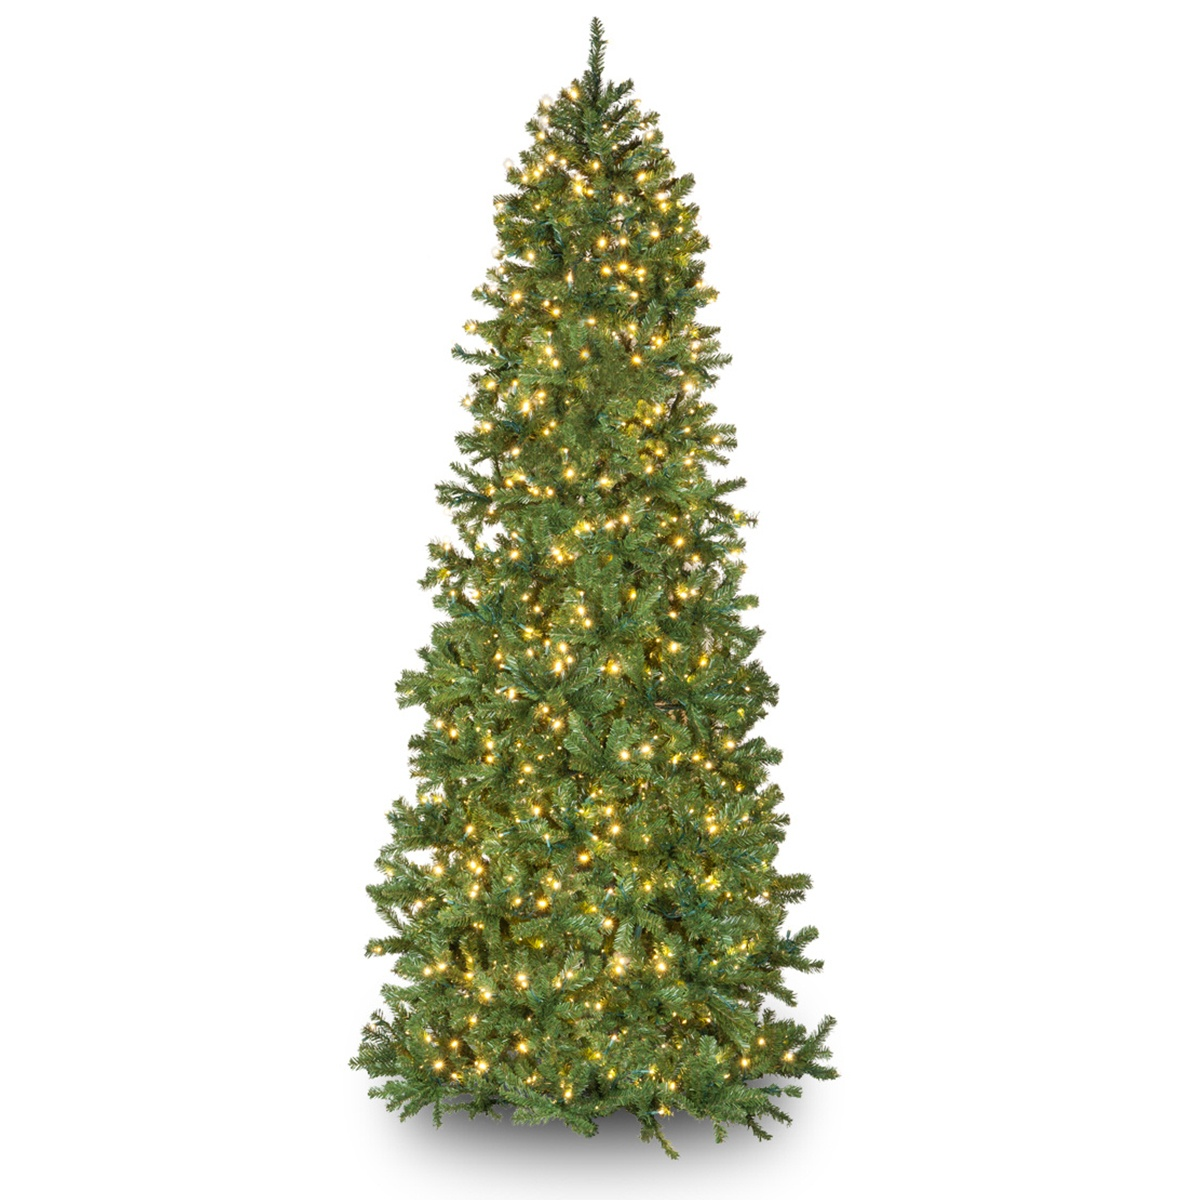 Douglas Fir Christmas Tree.Slender Douglas Fir Prelit Tree